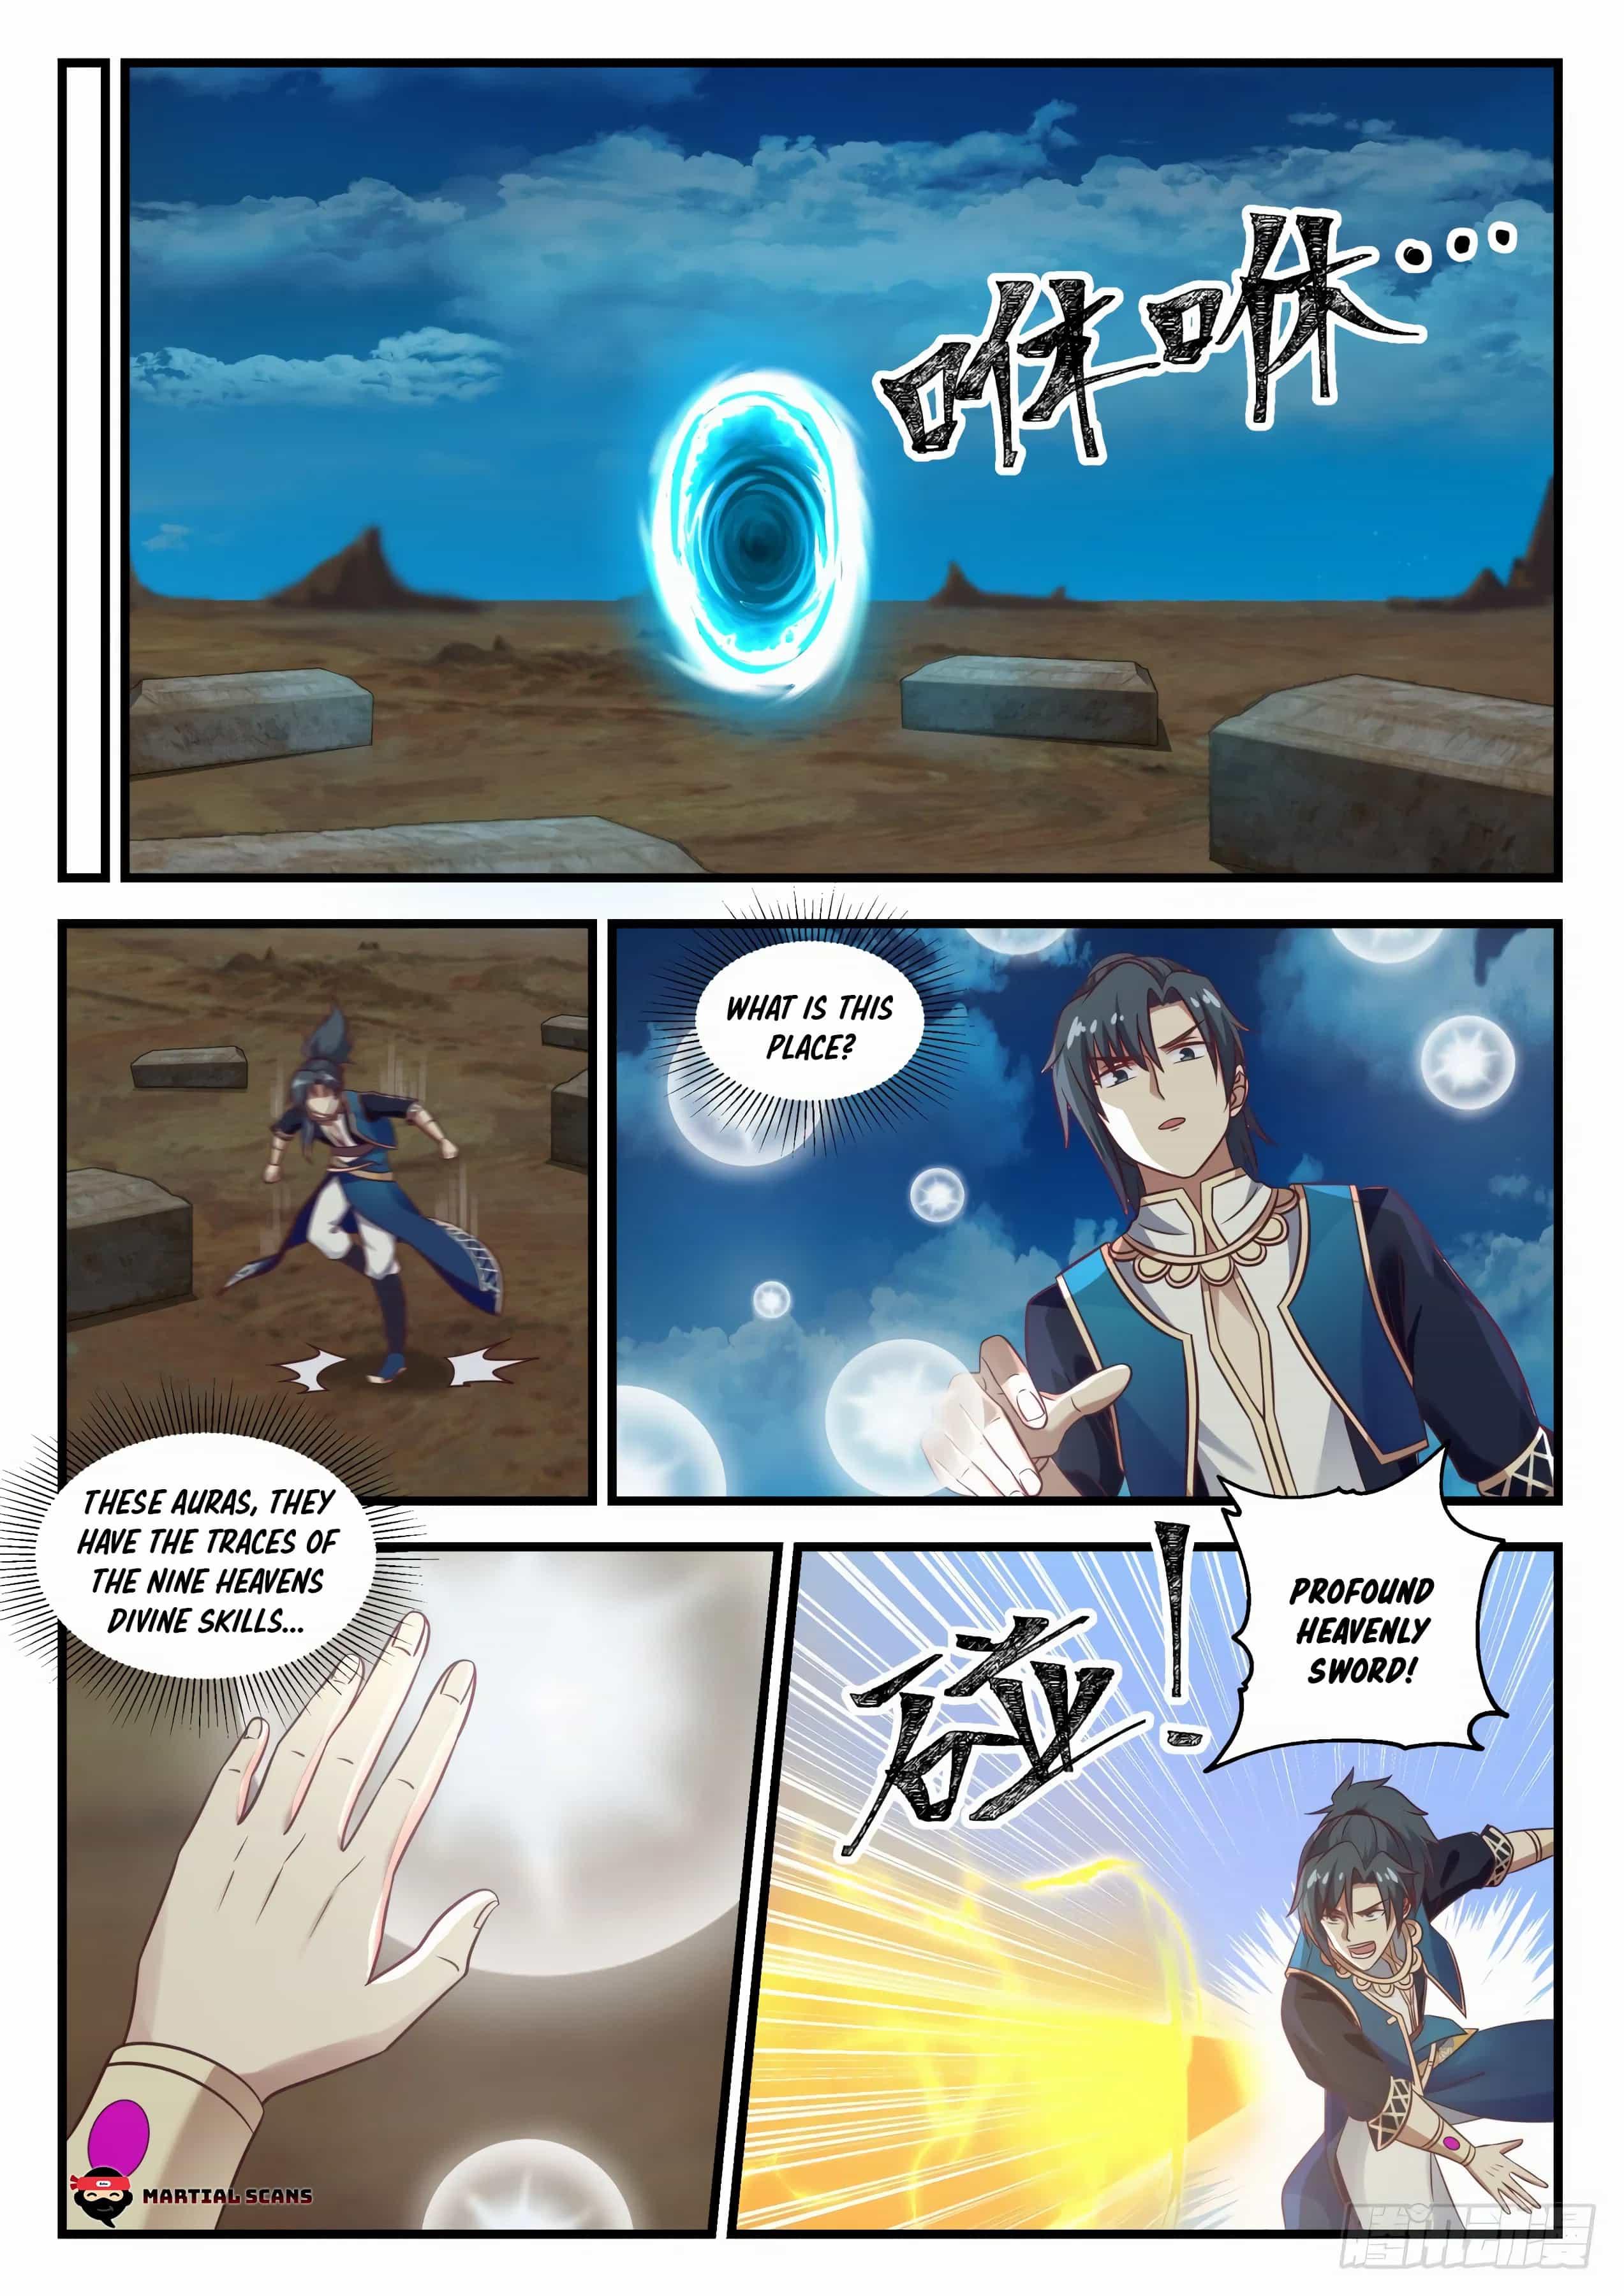 Martial Peak - chapter 719-eng-li